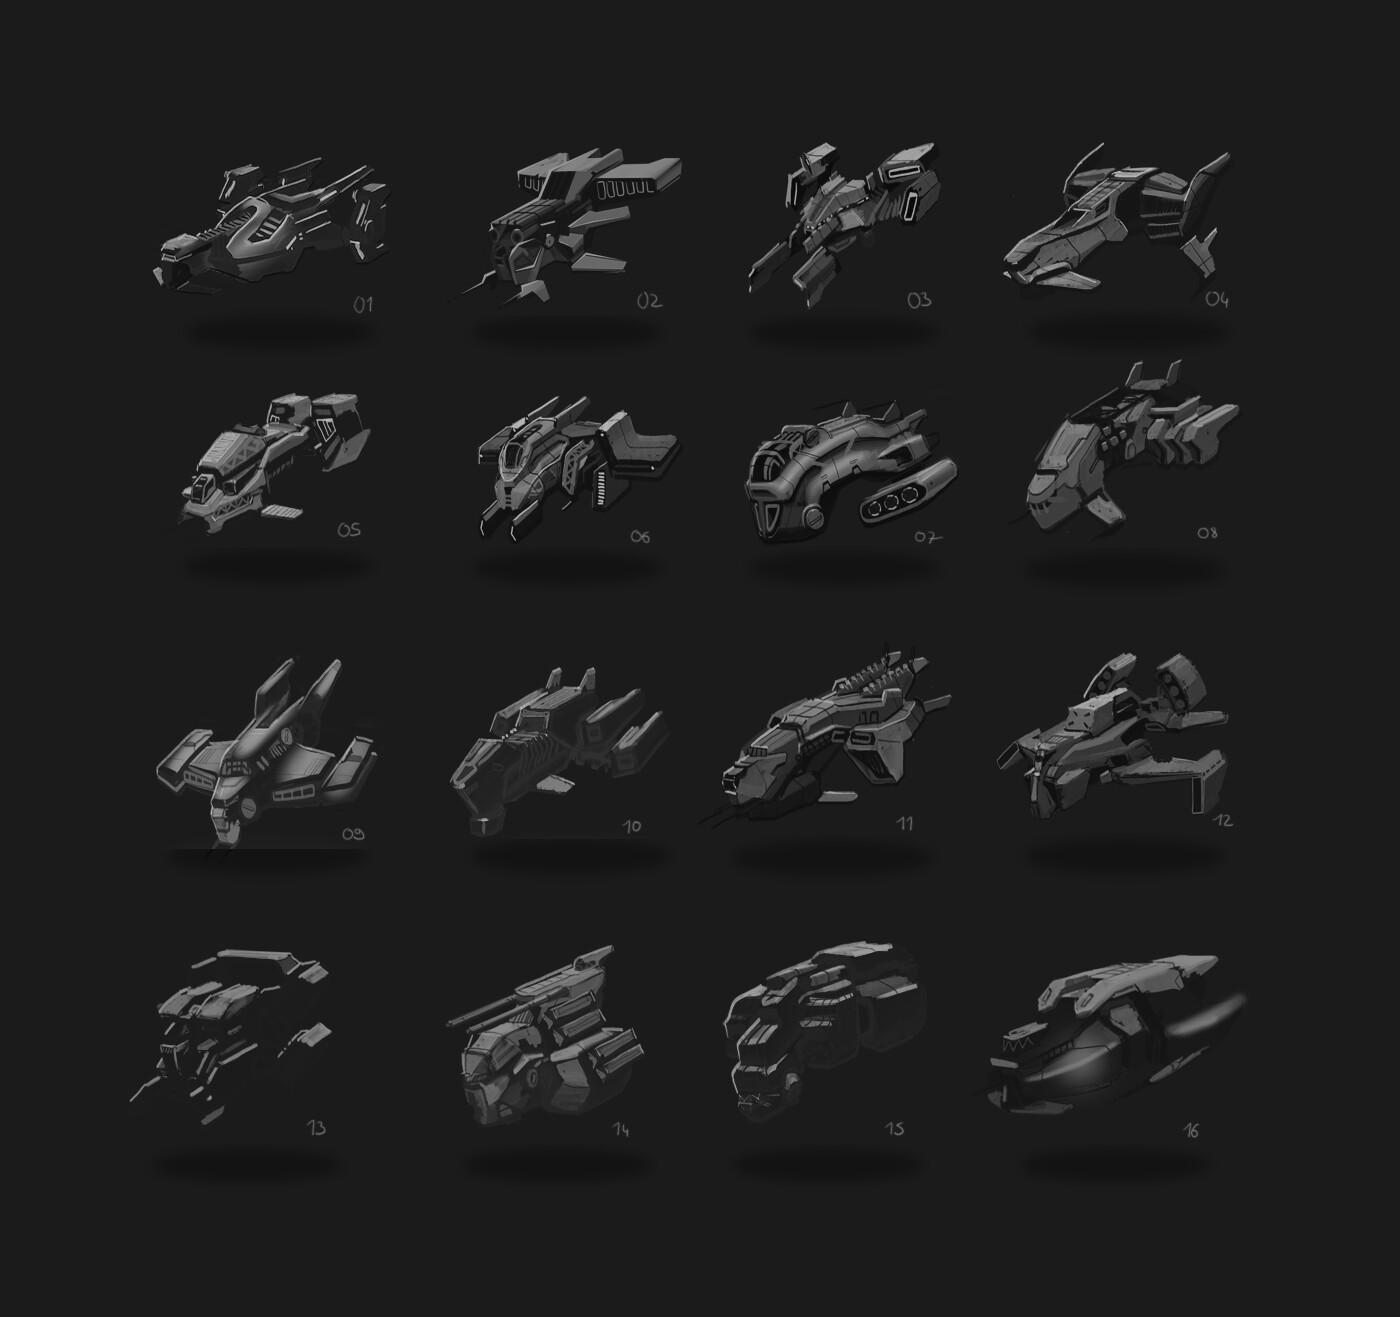 Shape exploration thumbnails.